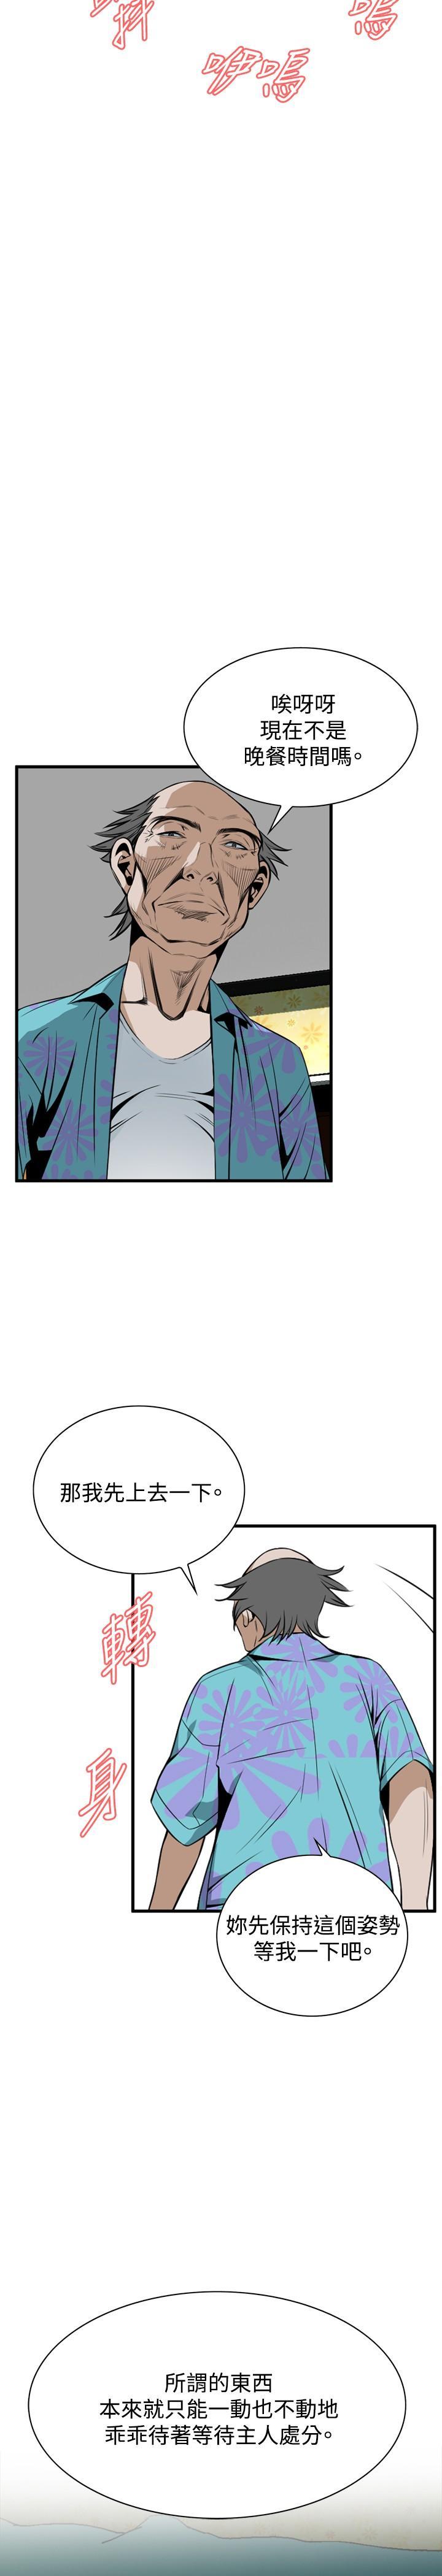 Take a Peek 偷窥 Ch.39~55 [Chinese]中文 135